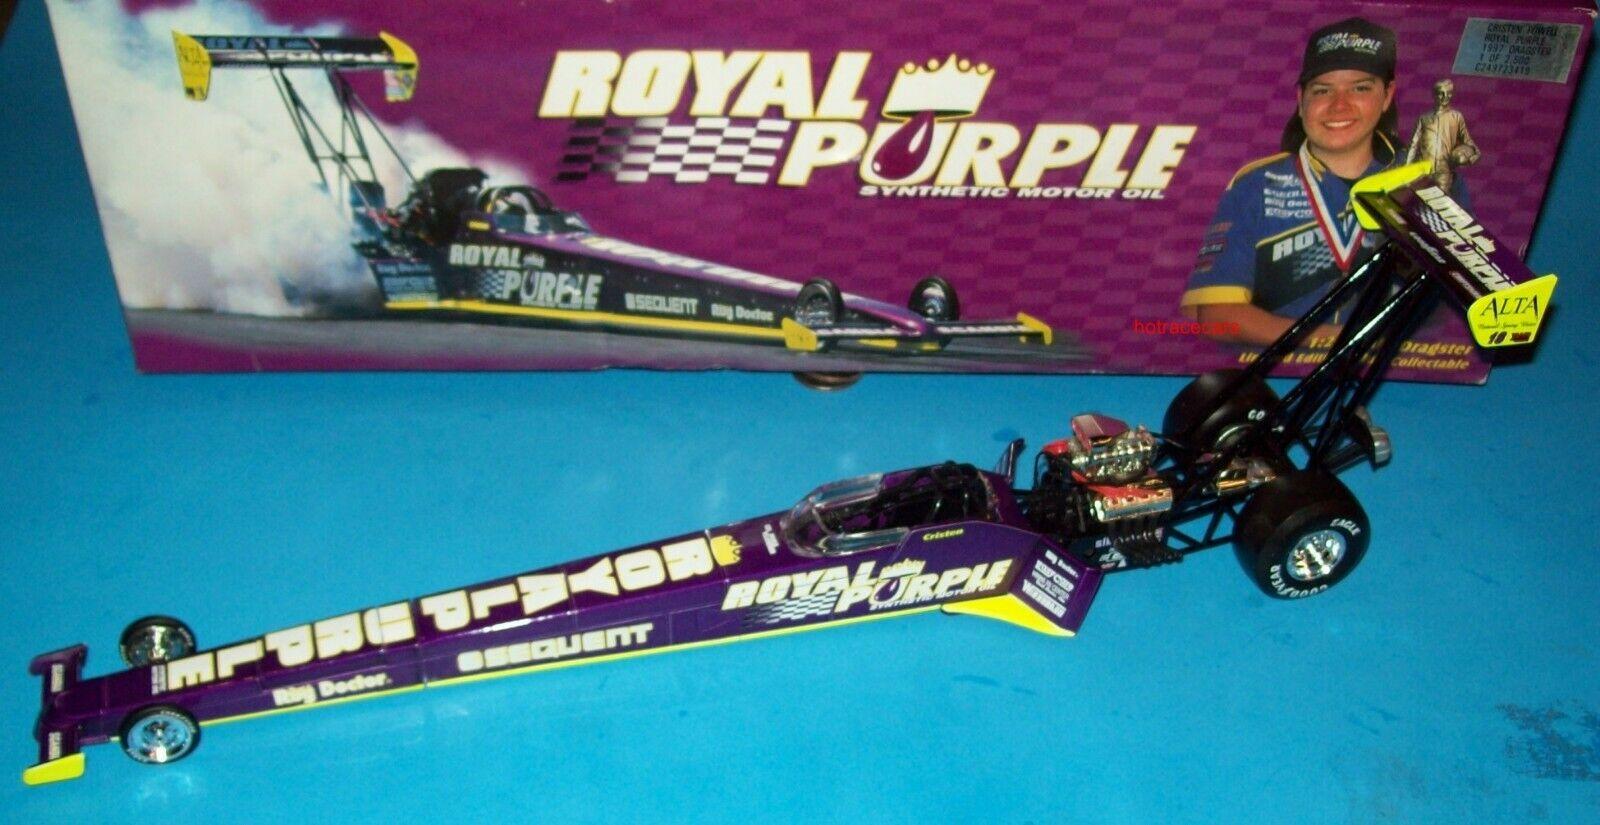 Cristen Powell 1997 Royal viola Top Fuel Dragster 1 24 Racing Collectables Club of America Vintage Asociación Nacional de Hot Rod